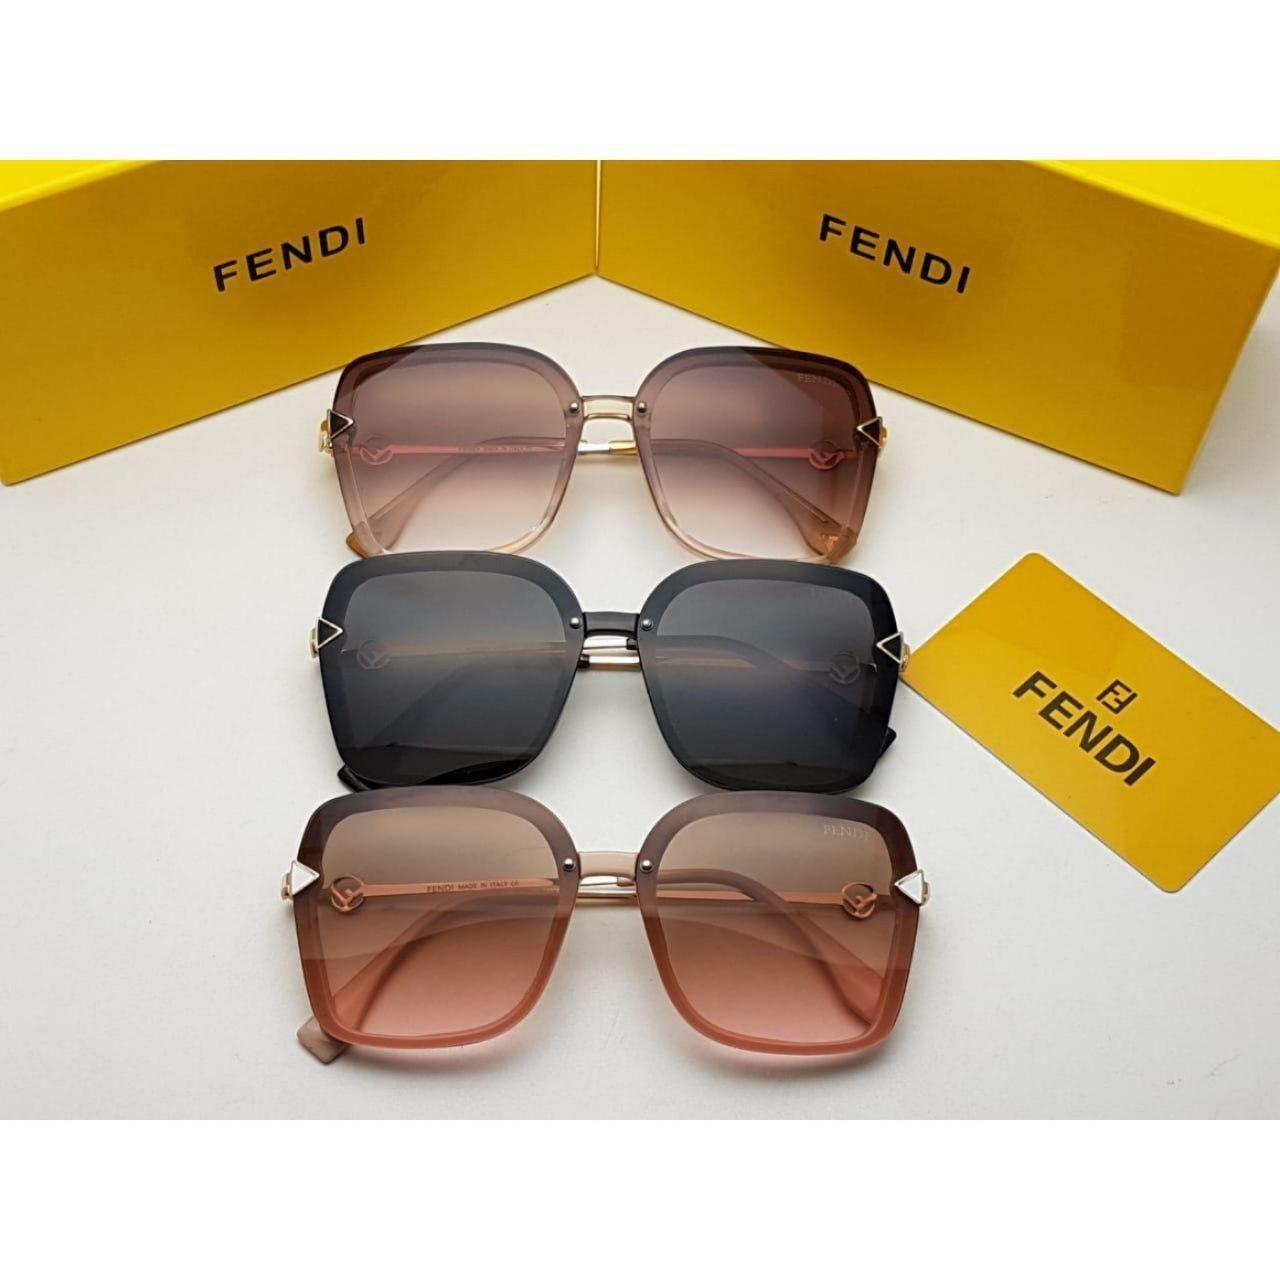 نظارات فندي نسائي Fendi درجه اولى مع جميع الملحقات وبنفس اسم الماركه هدايا هنوف Sunglasses Glasses